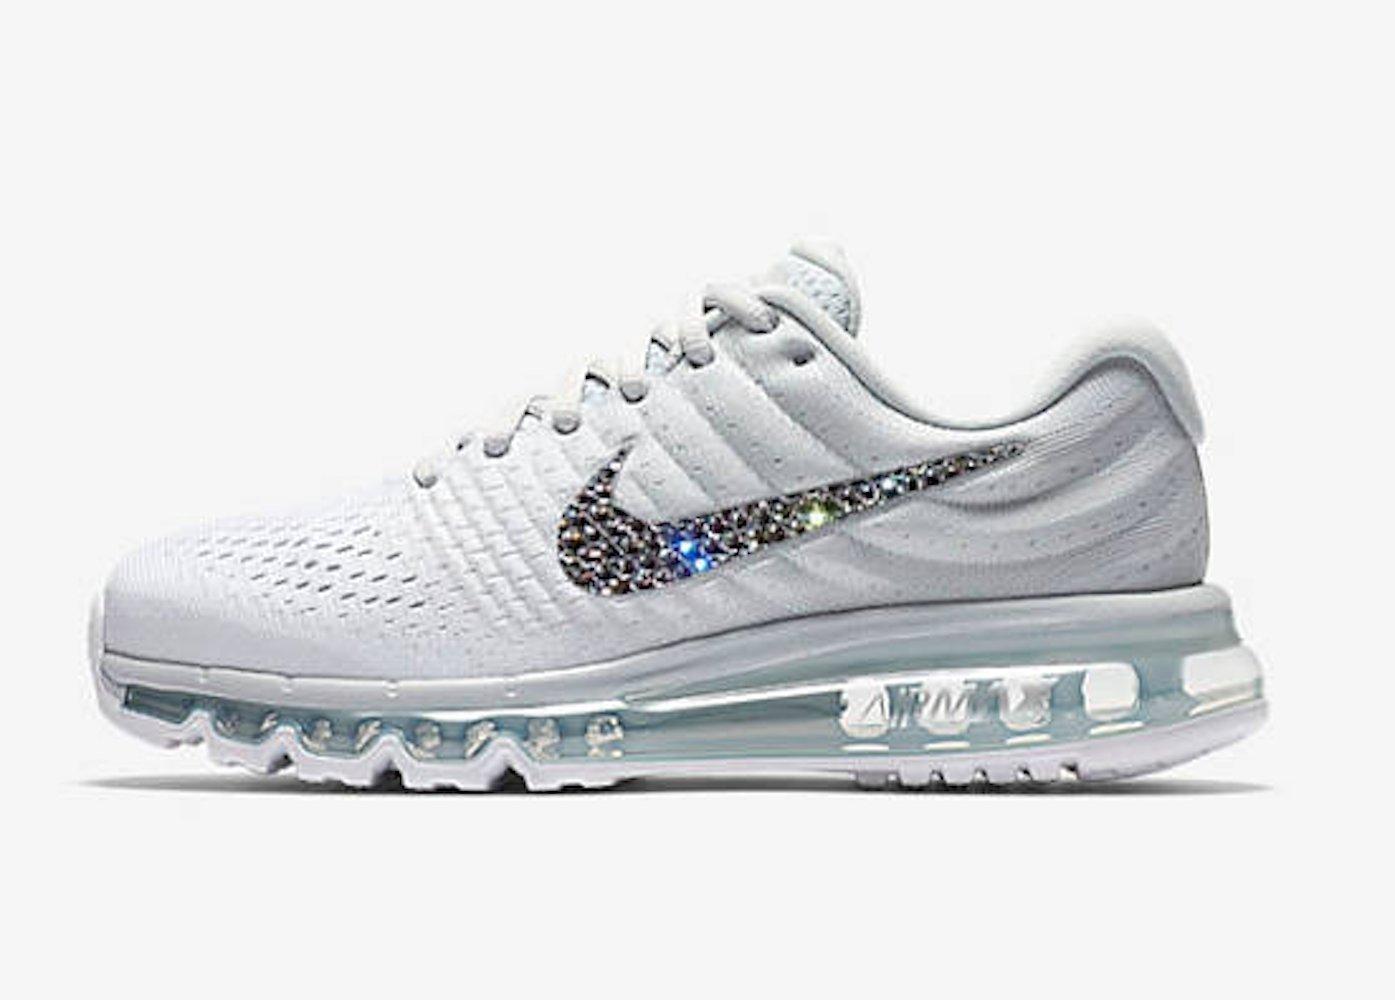 Womens Swarovski Nike air max 2017, Blinged out Nike shoes, Bling nike air max, Blinged Nike air max, Bling Nikes, Nike bling